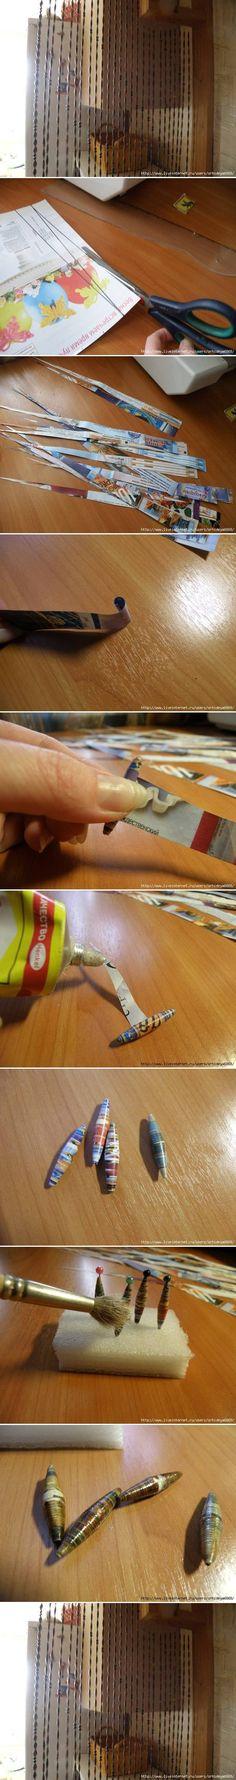 DIY Newspaper Beads Curtain DIY Projects | UsefulDIY.com Follow Us on Facebook ==> http://www.facebook.com/UsefulDiy